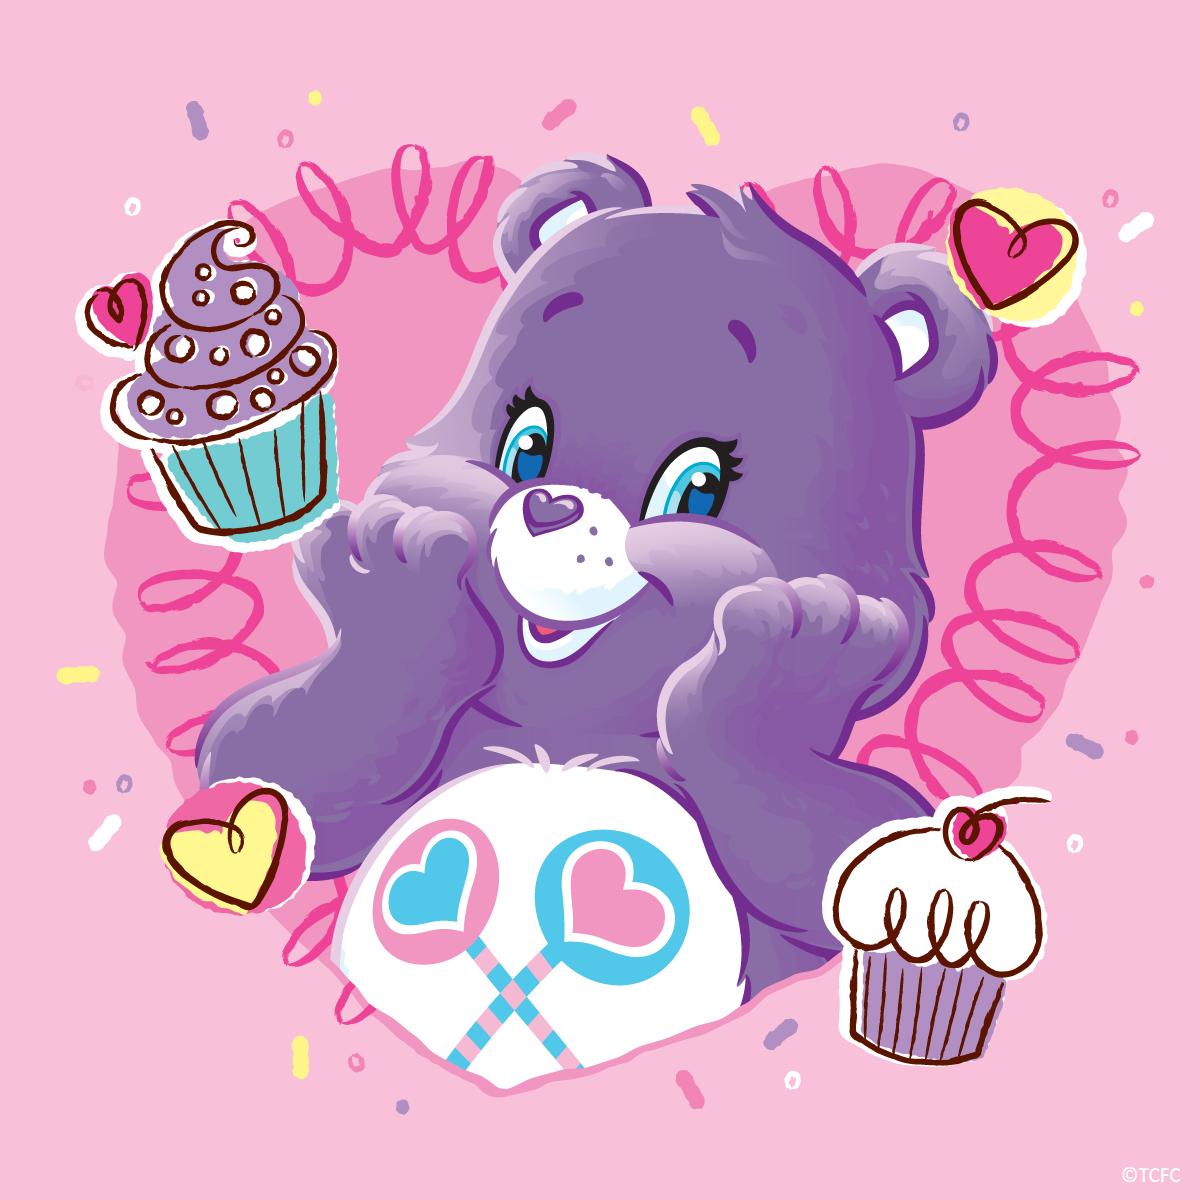 Care Bears Wallpaper: Care Bears:) Happy Birthday